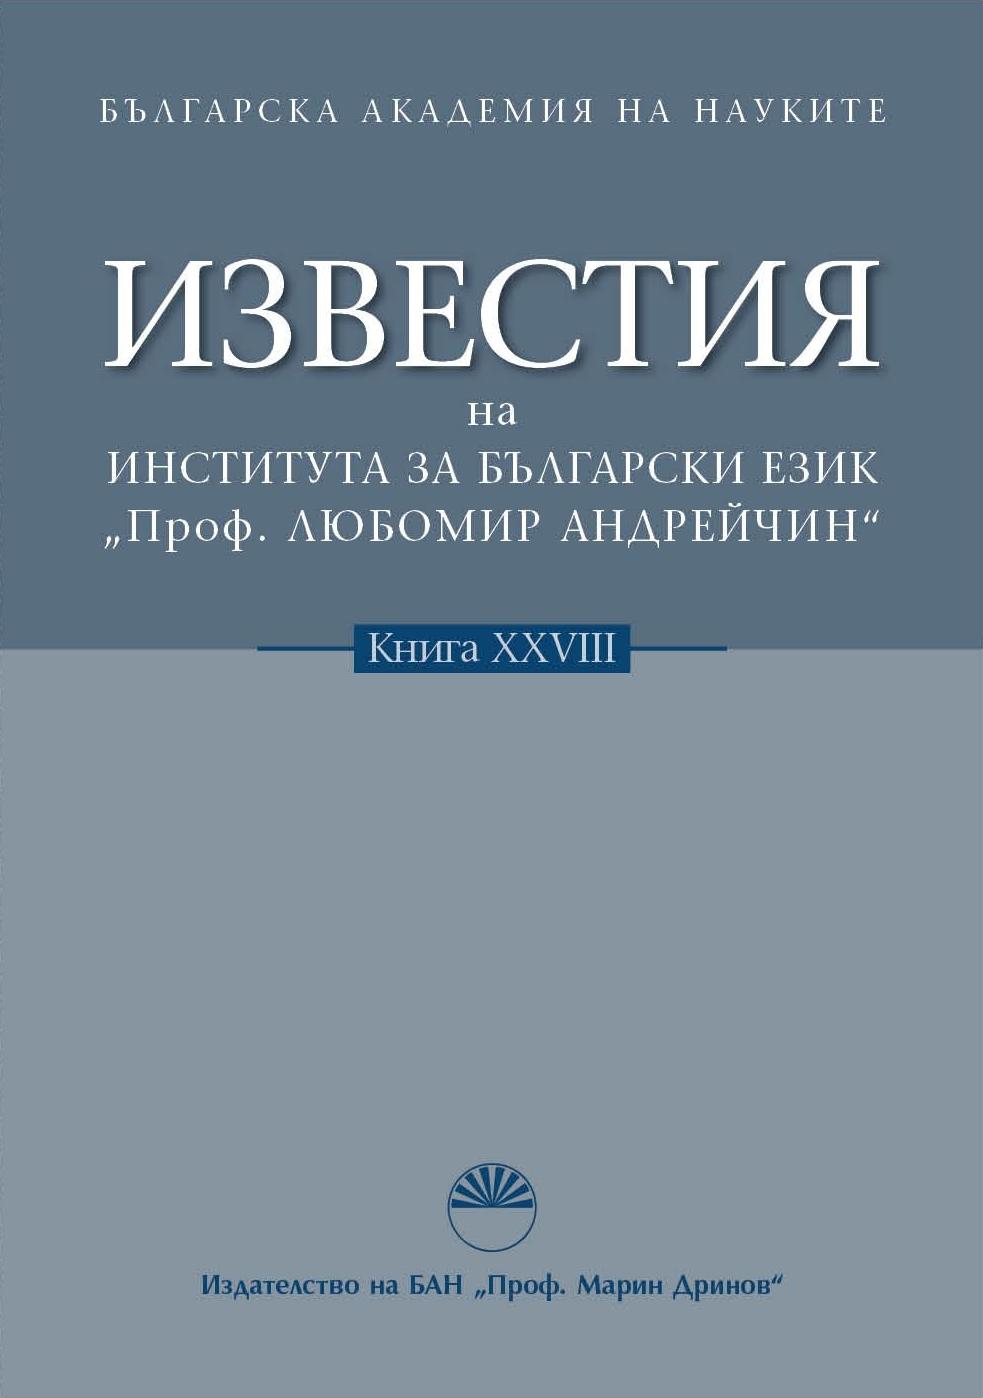 Izvestia BG Ezik XXVIII Cover-1a